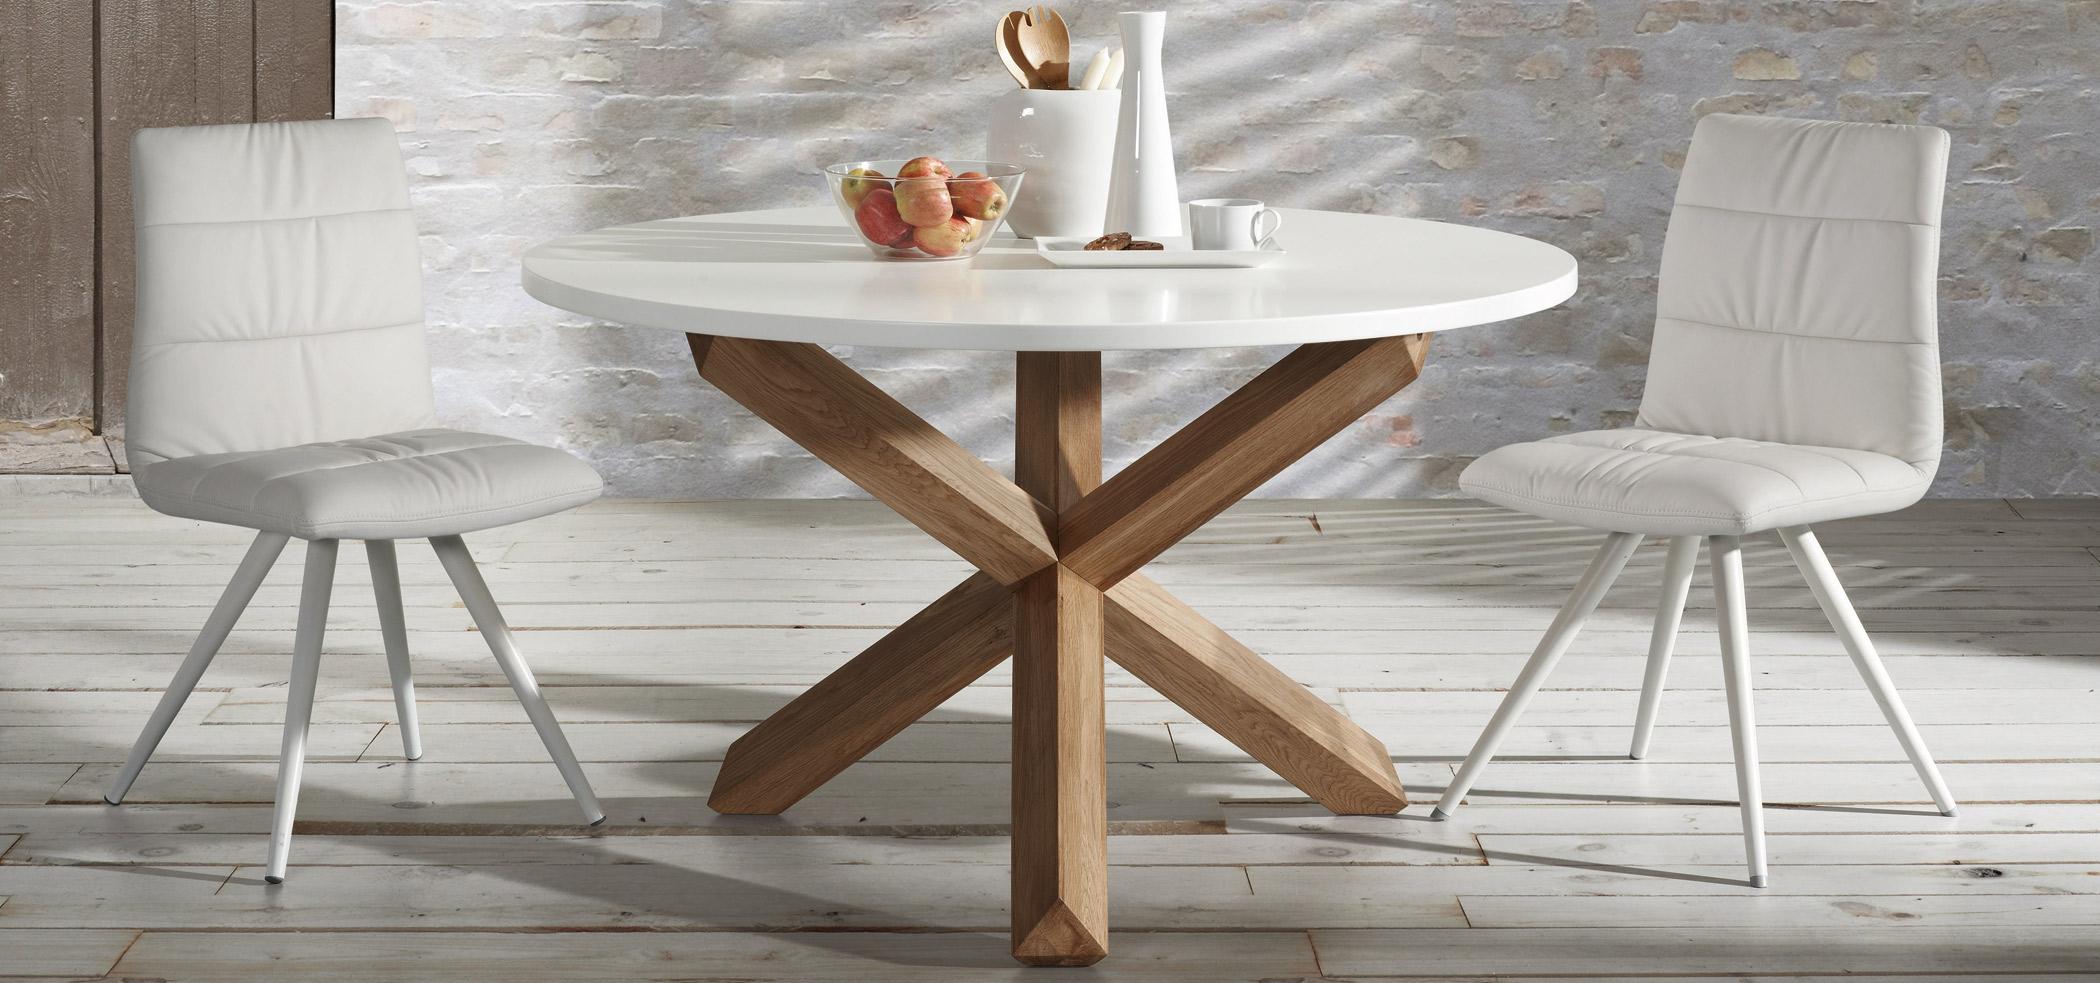 Eetkamertafel rond nori kleur eik naturel bovenblad wit wit